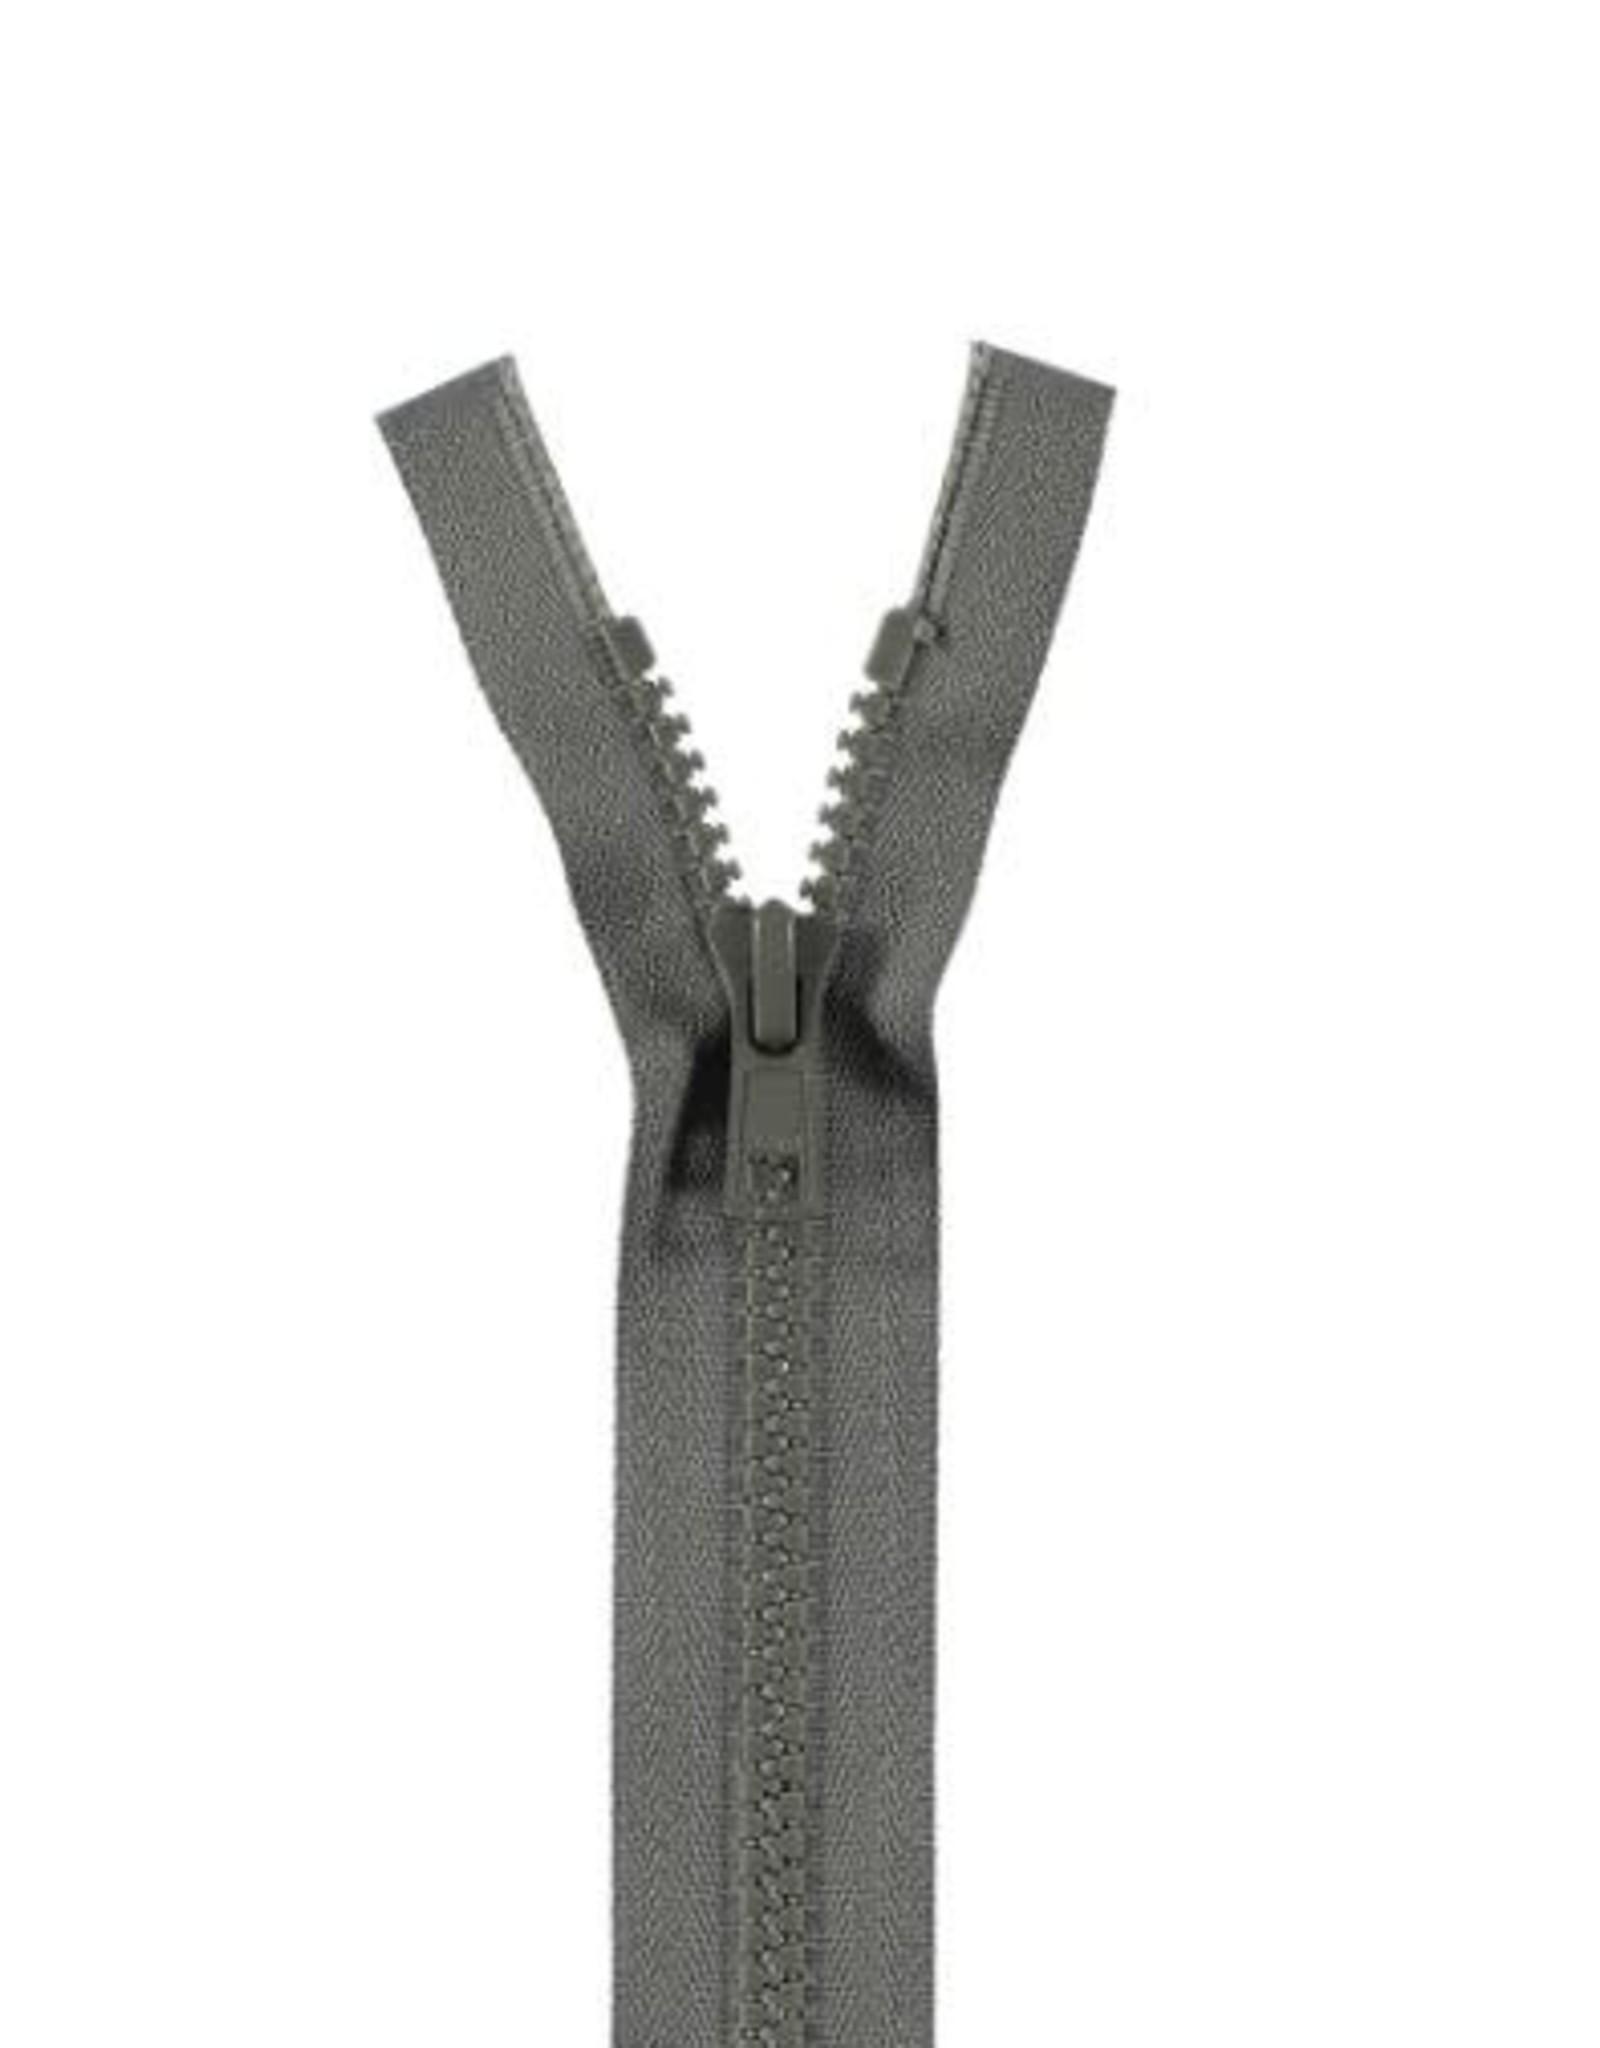 YKK BLOKRITS 5 DEELBAAR grijs 578-55cm